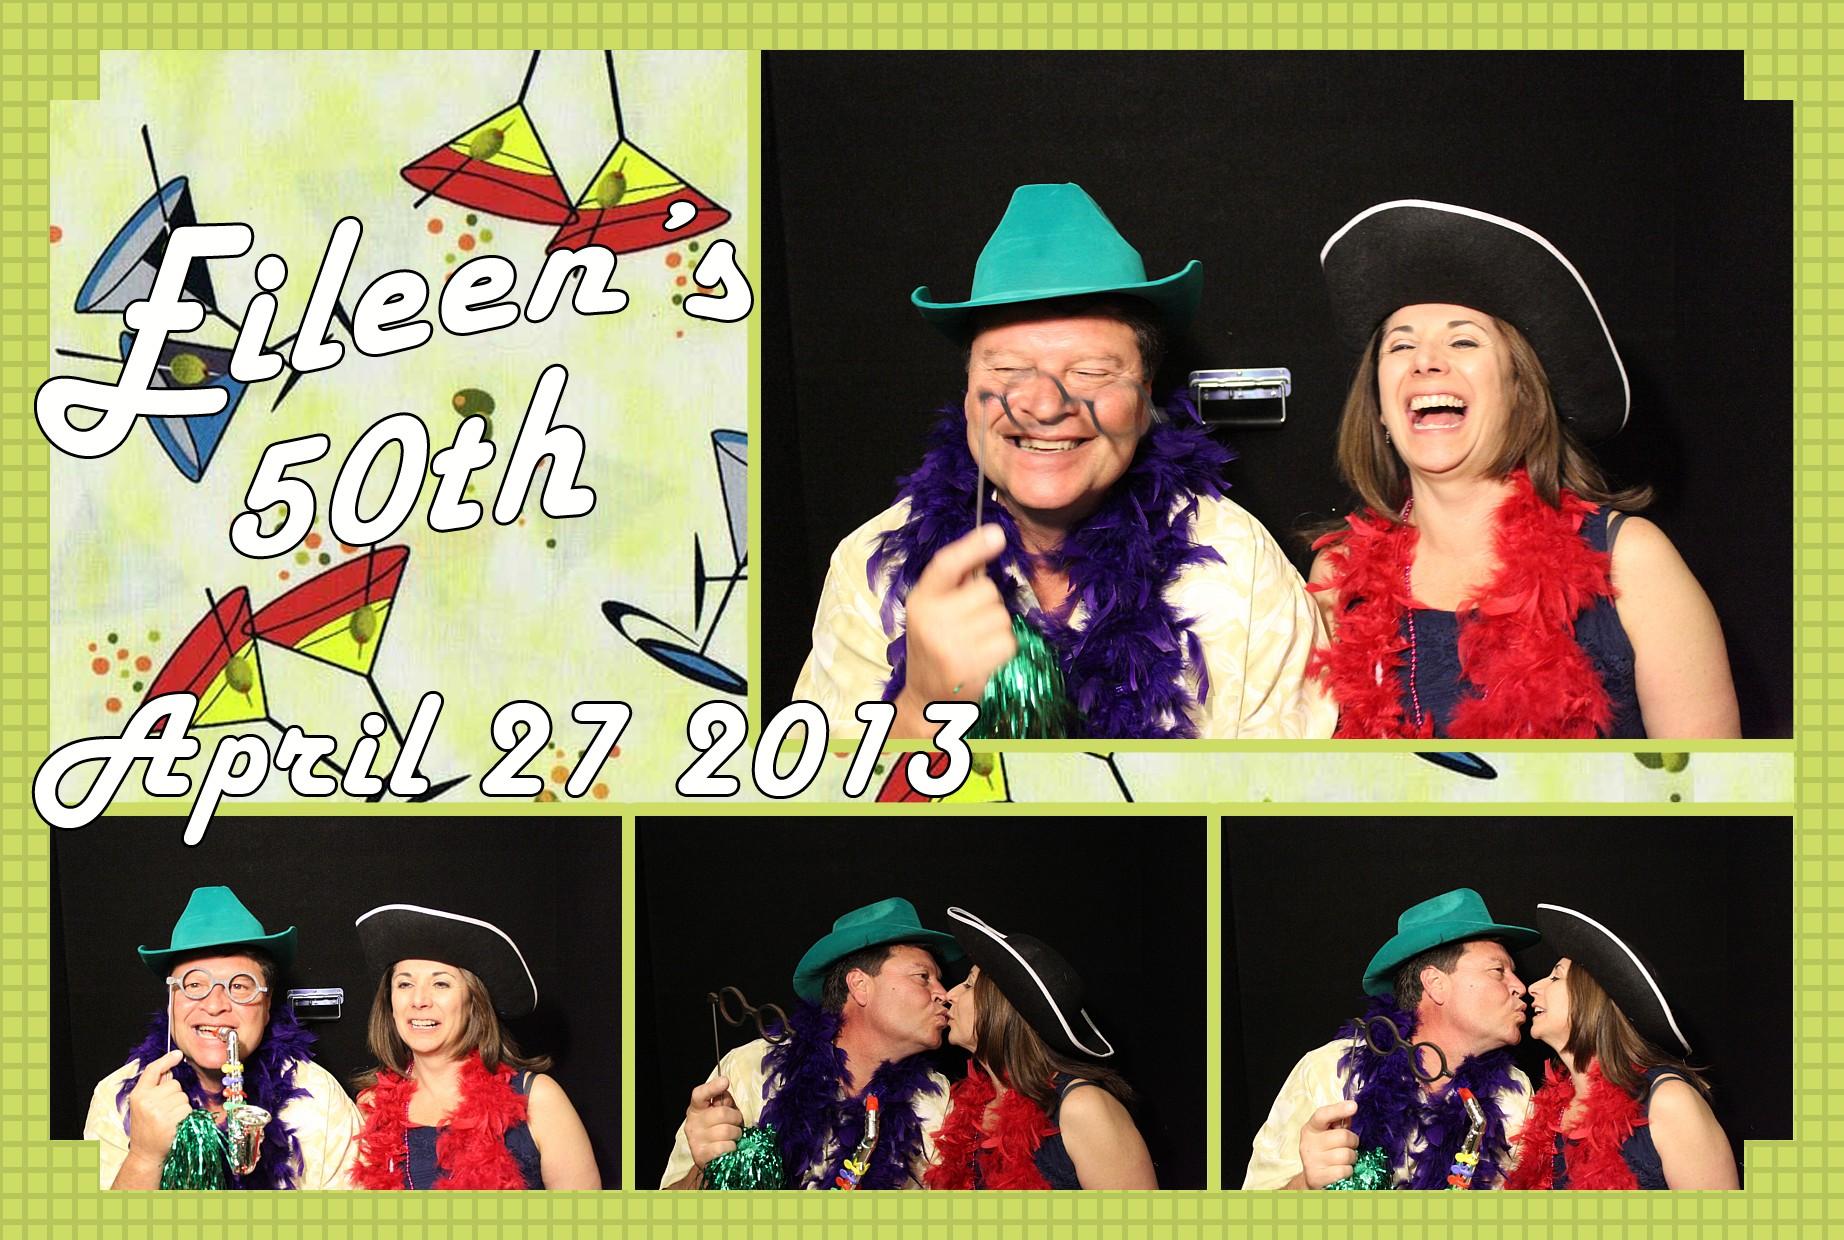 Happy Birthday Eileen!